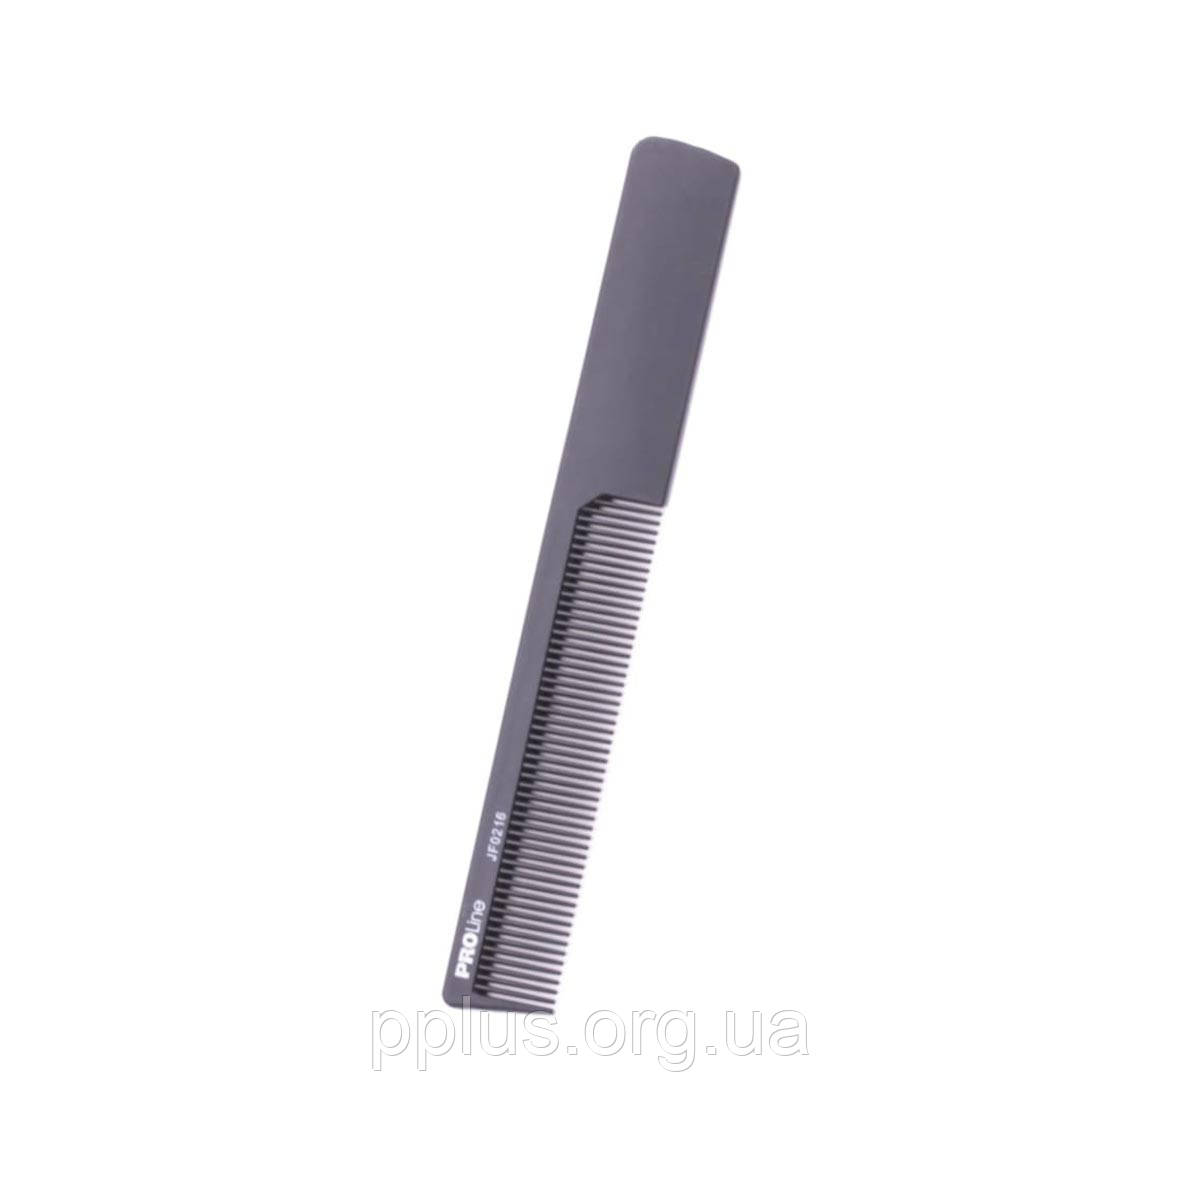 JF0216 Гребень парикмахерский Proline